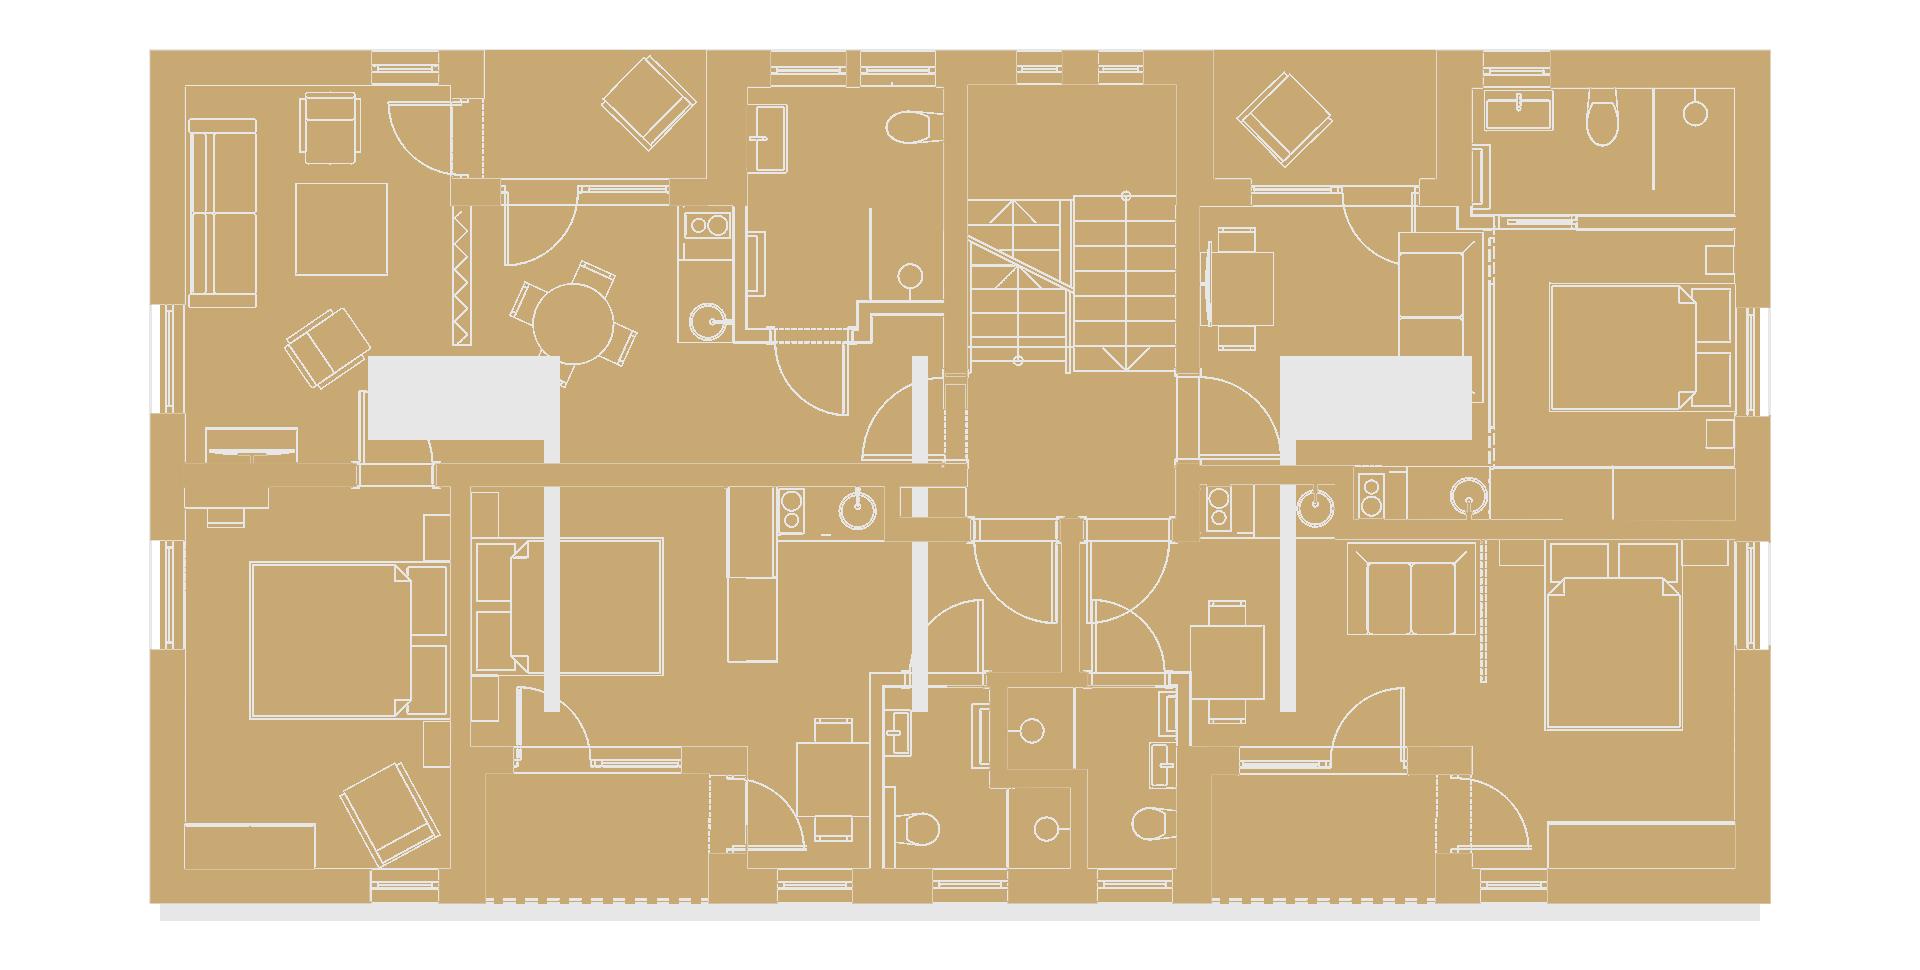 Budynek A – pietro 1 – white